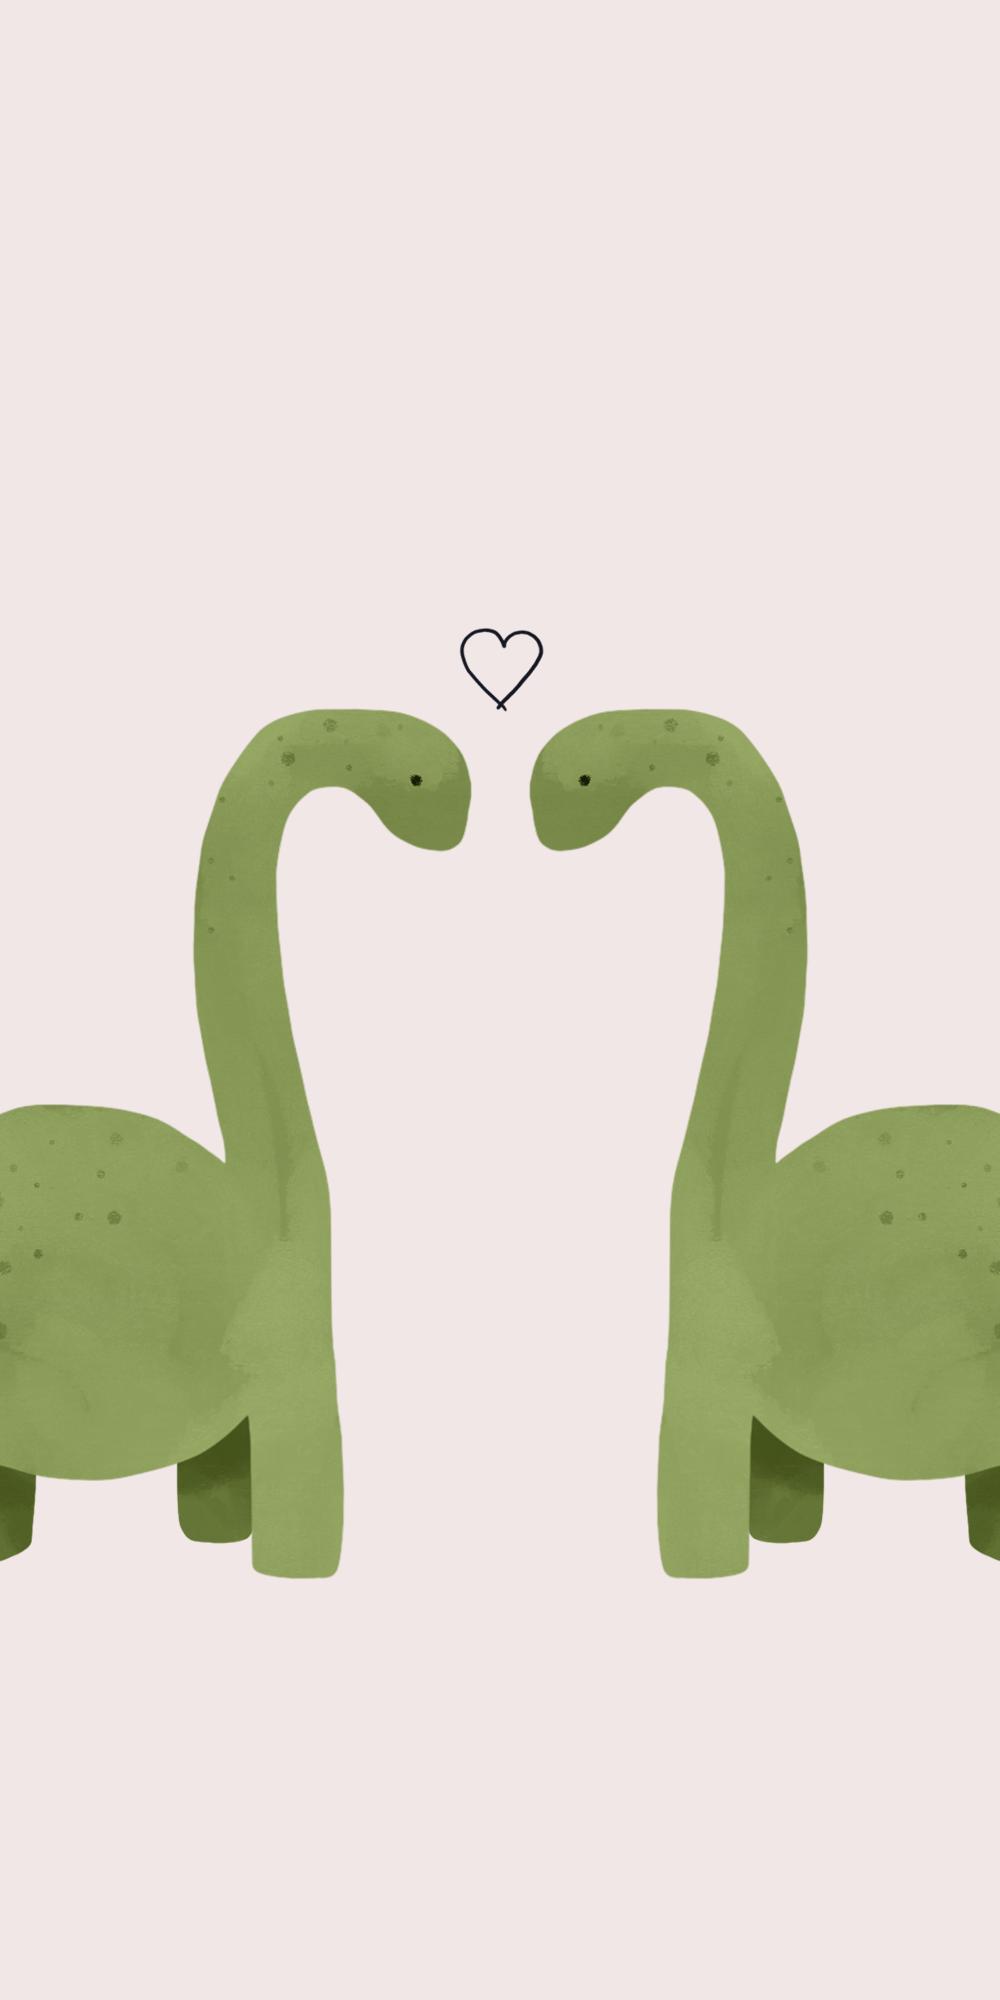 Cute Dinosaur Iphone Wallpapers Top Free Cute Dinosaur Iphone Backgrounds Wallpaperaccess